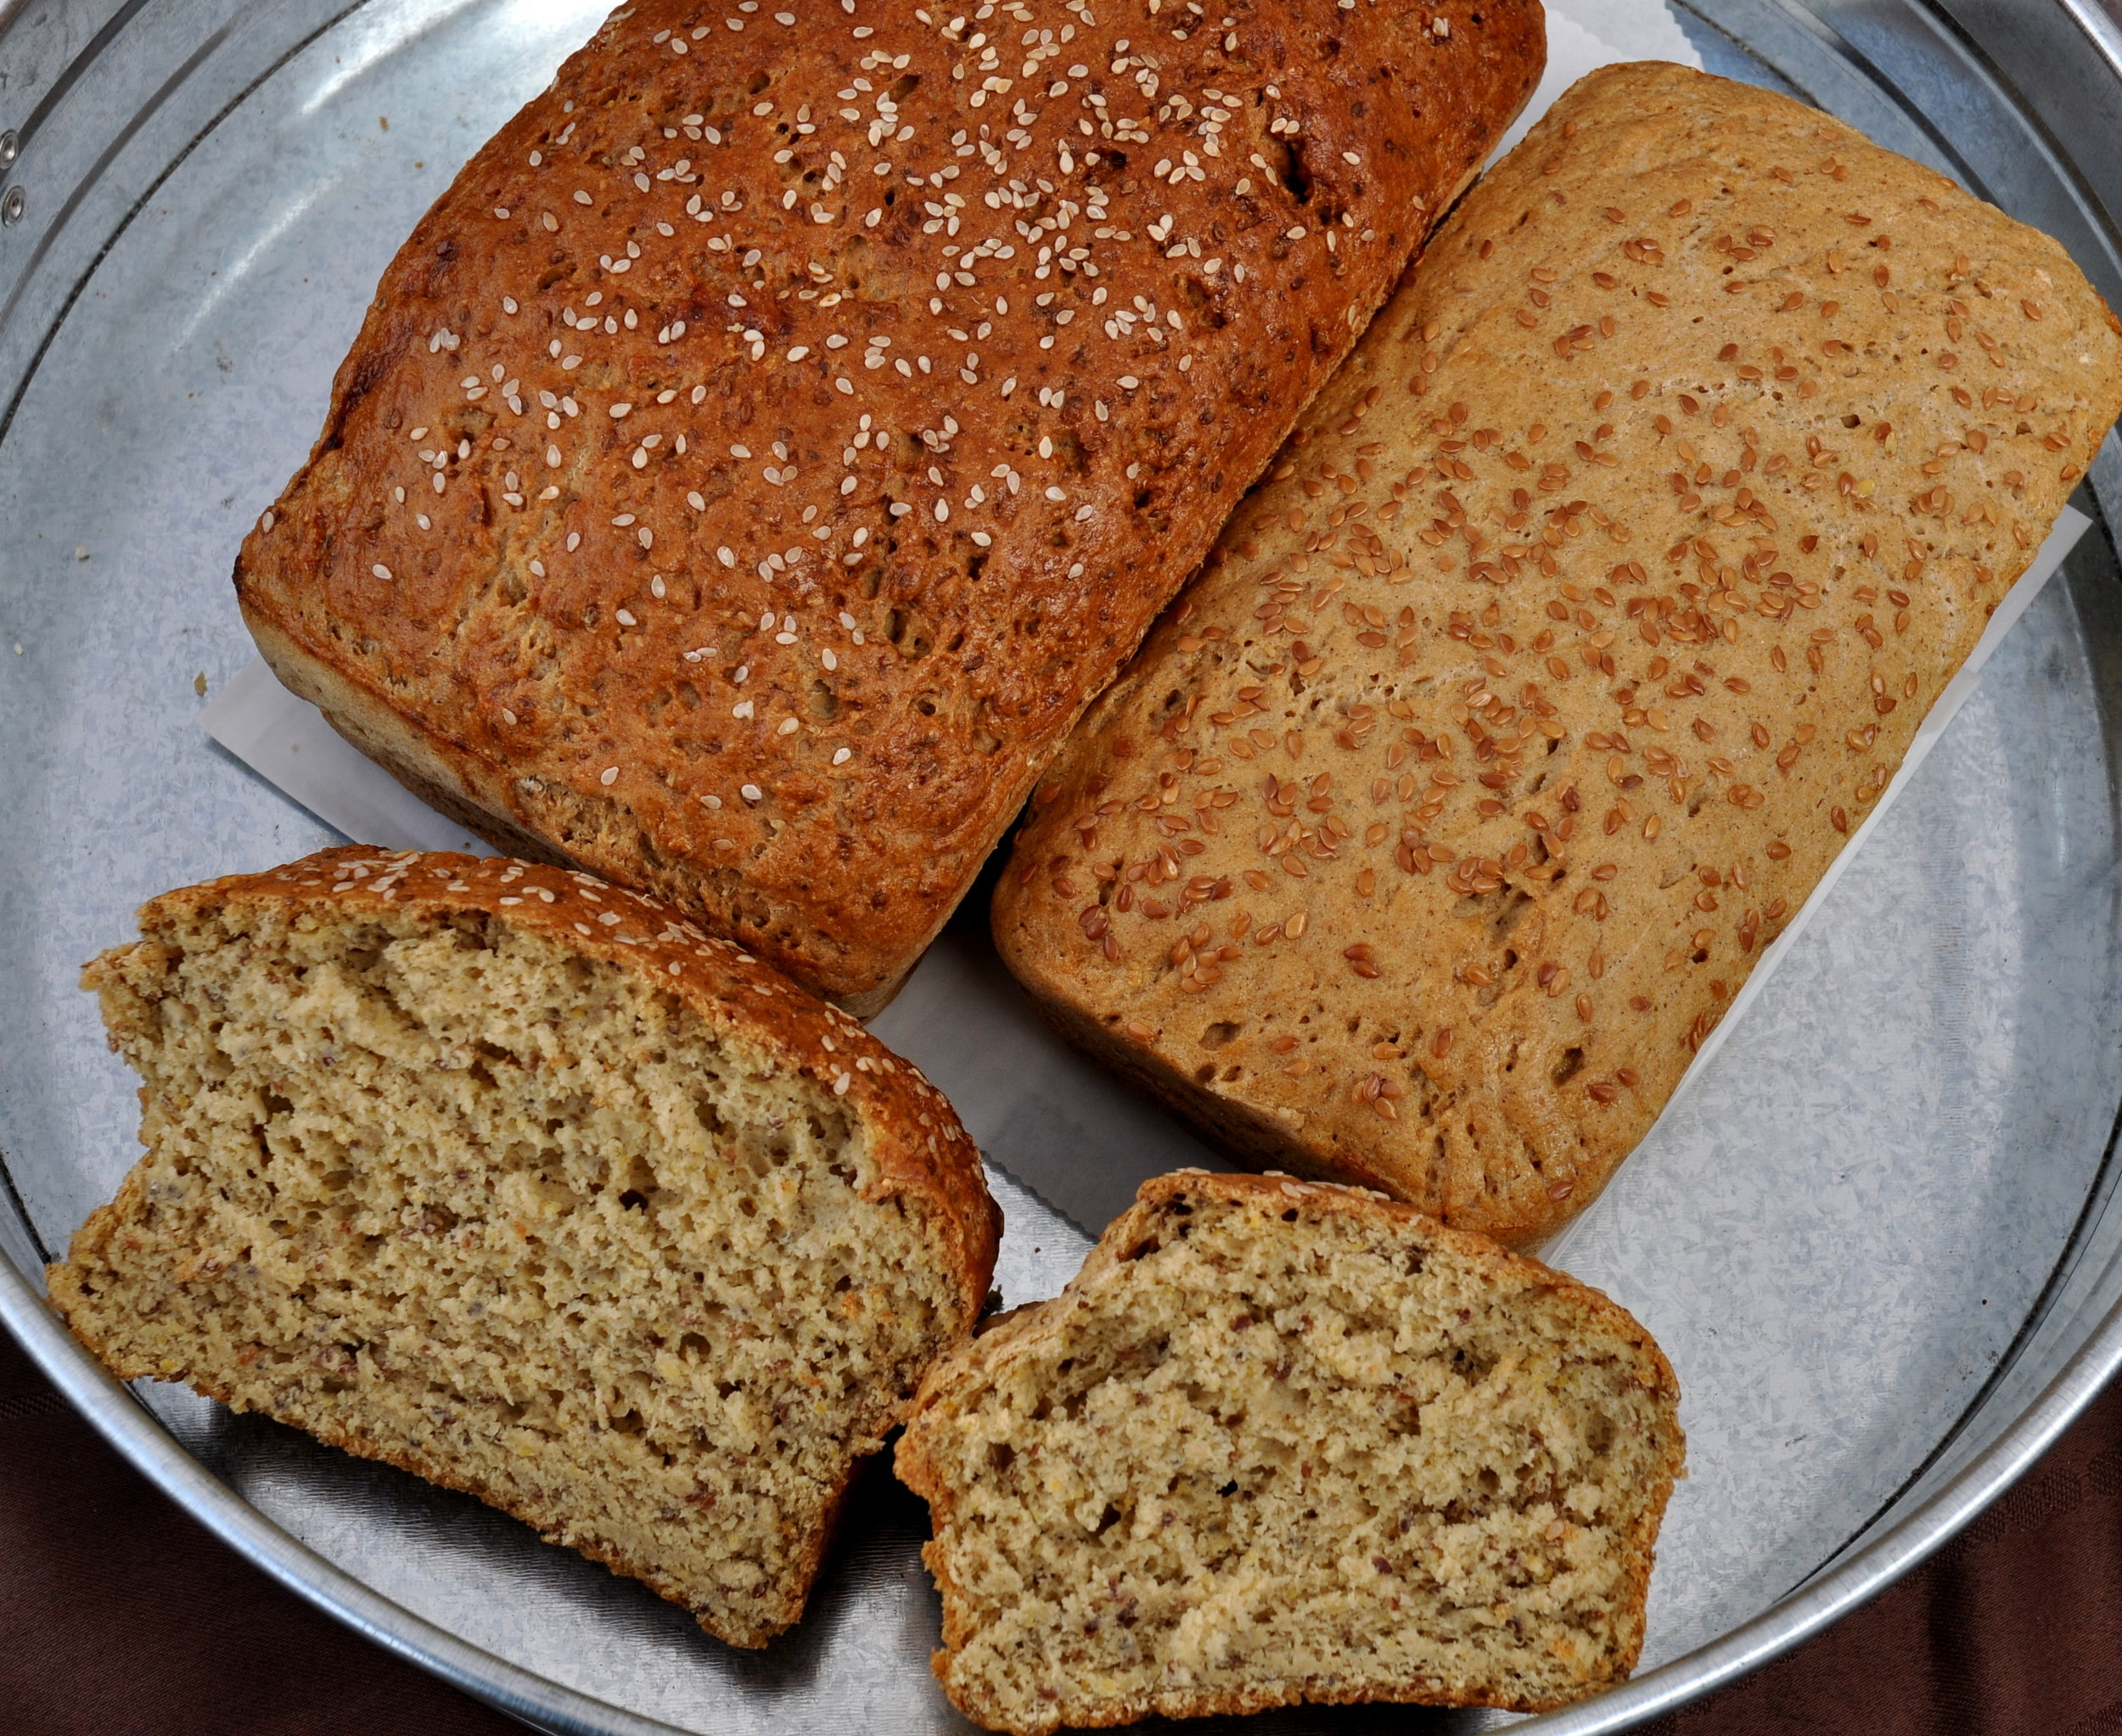 Gluten-free sandwich breads from d:floured gluten-free bakery. Photo copyright 2013 by Zachary D. Lyons.